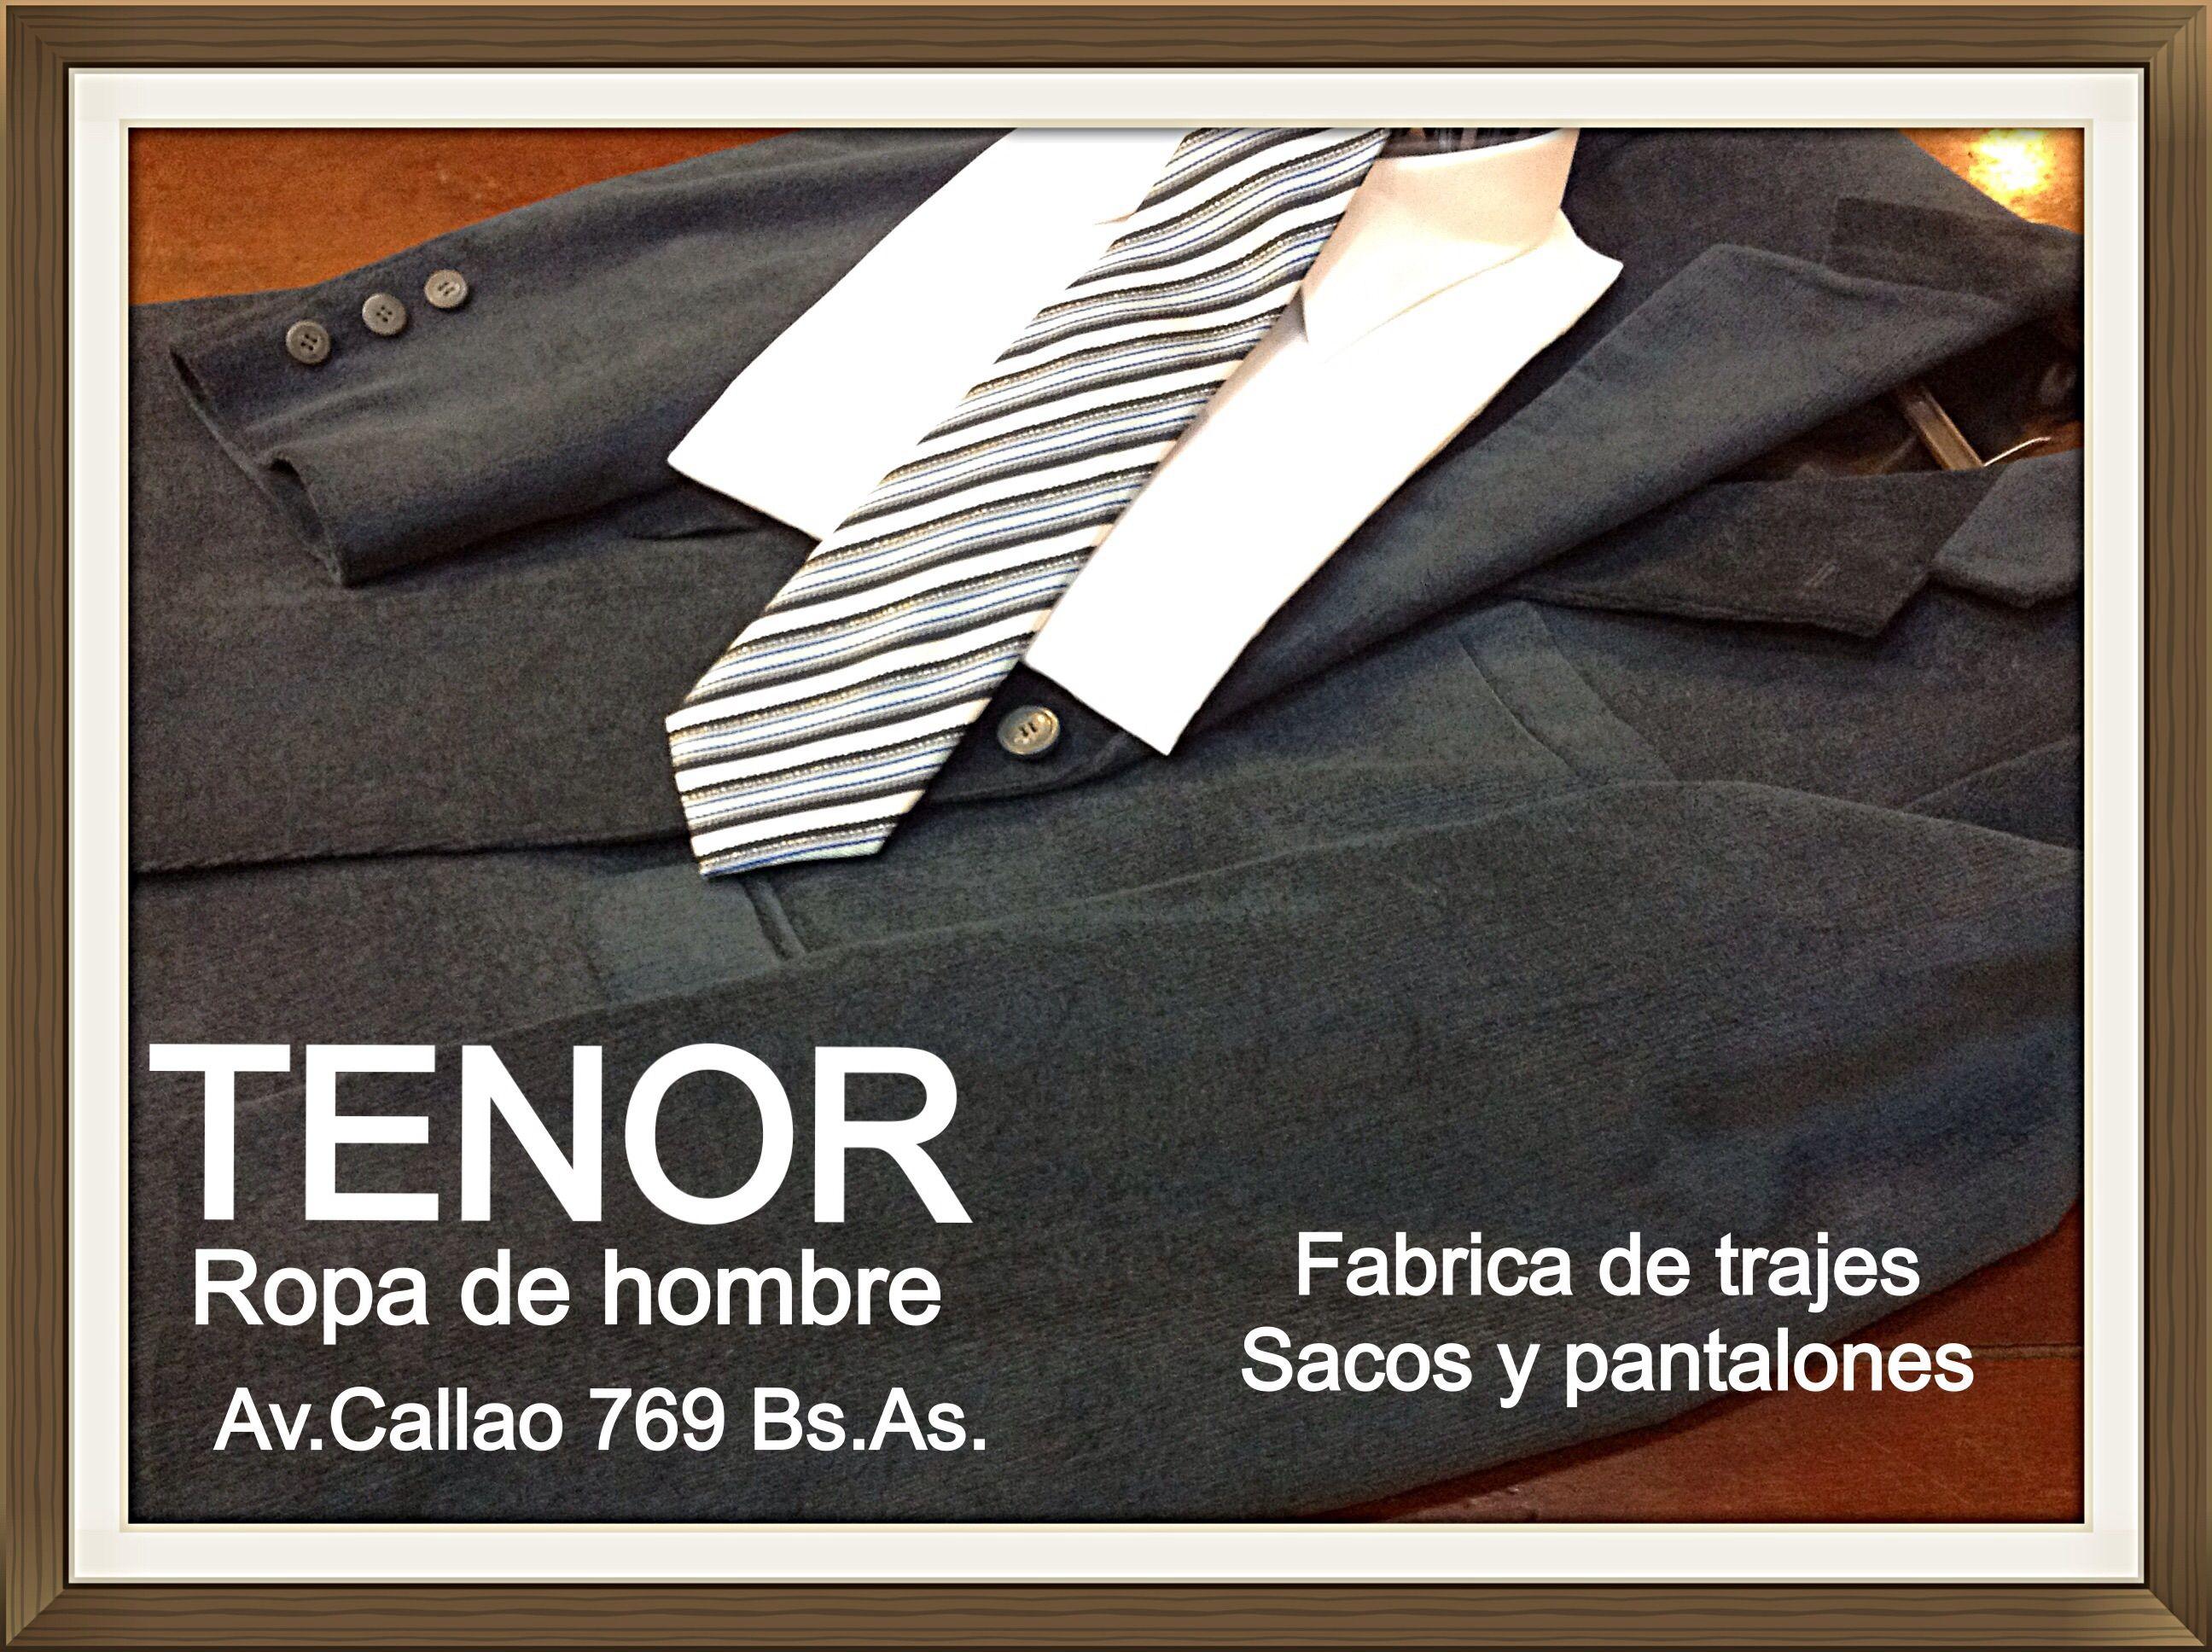 91acdf68 Fabrica de ropa para hombre | TENOR ropa de hombre ( men garment)